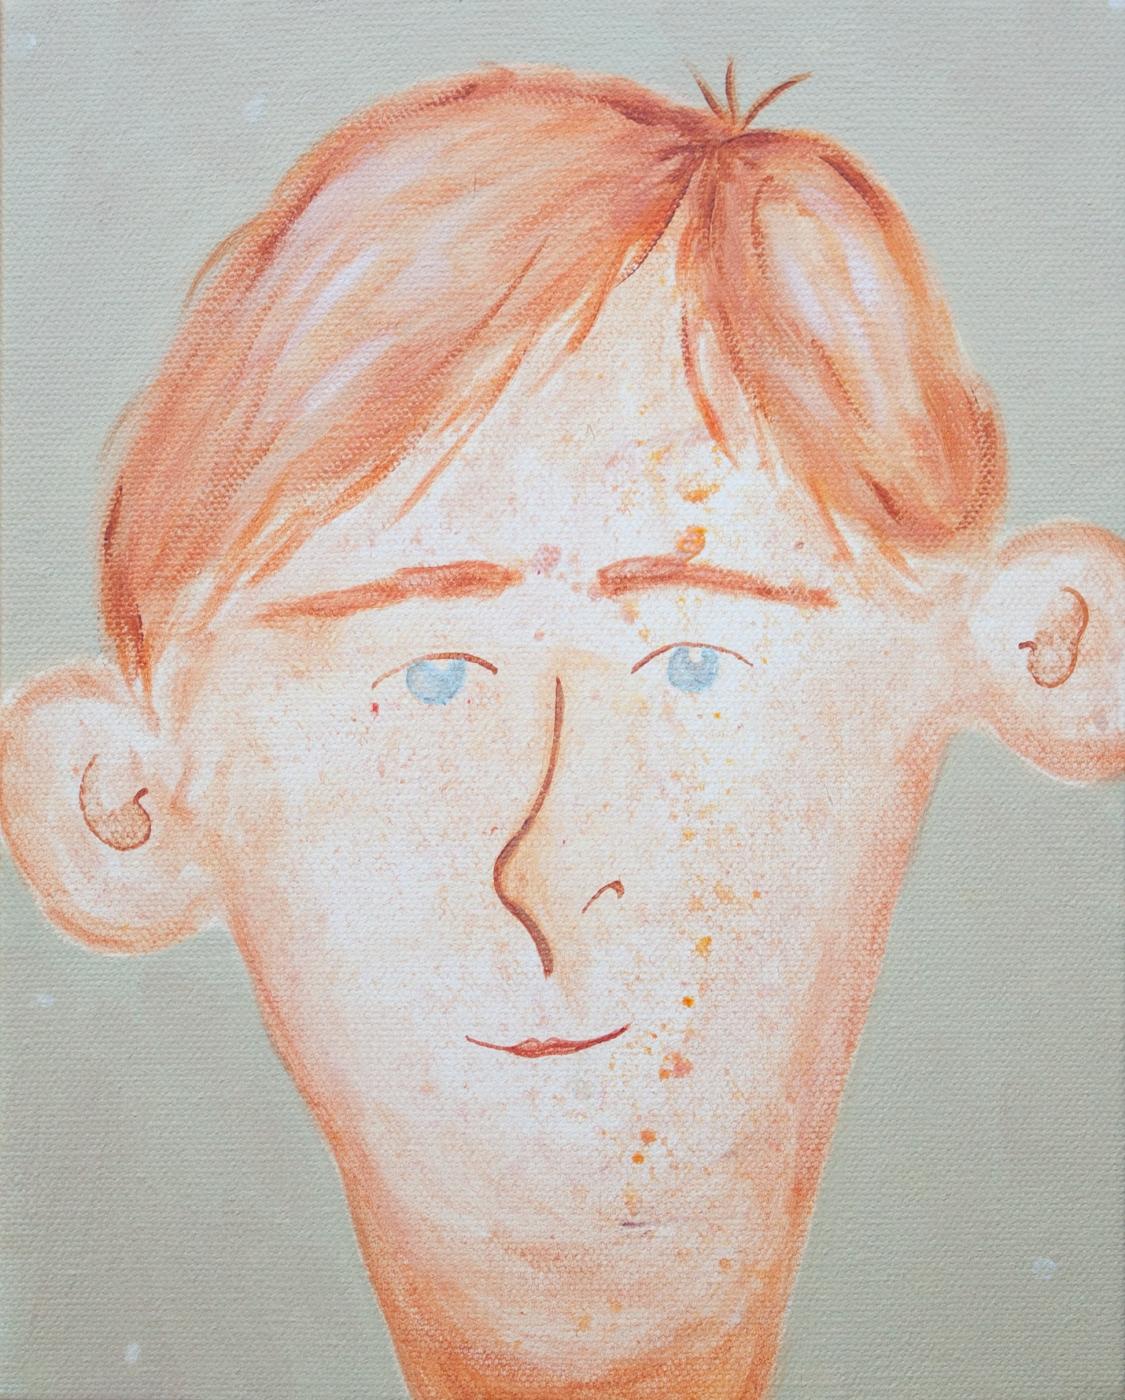 Chris-Czaja-Yearbook-Portrait-2.-Courtesy-of-the-Artist.jpg